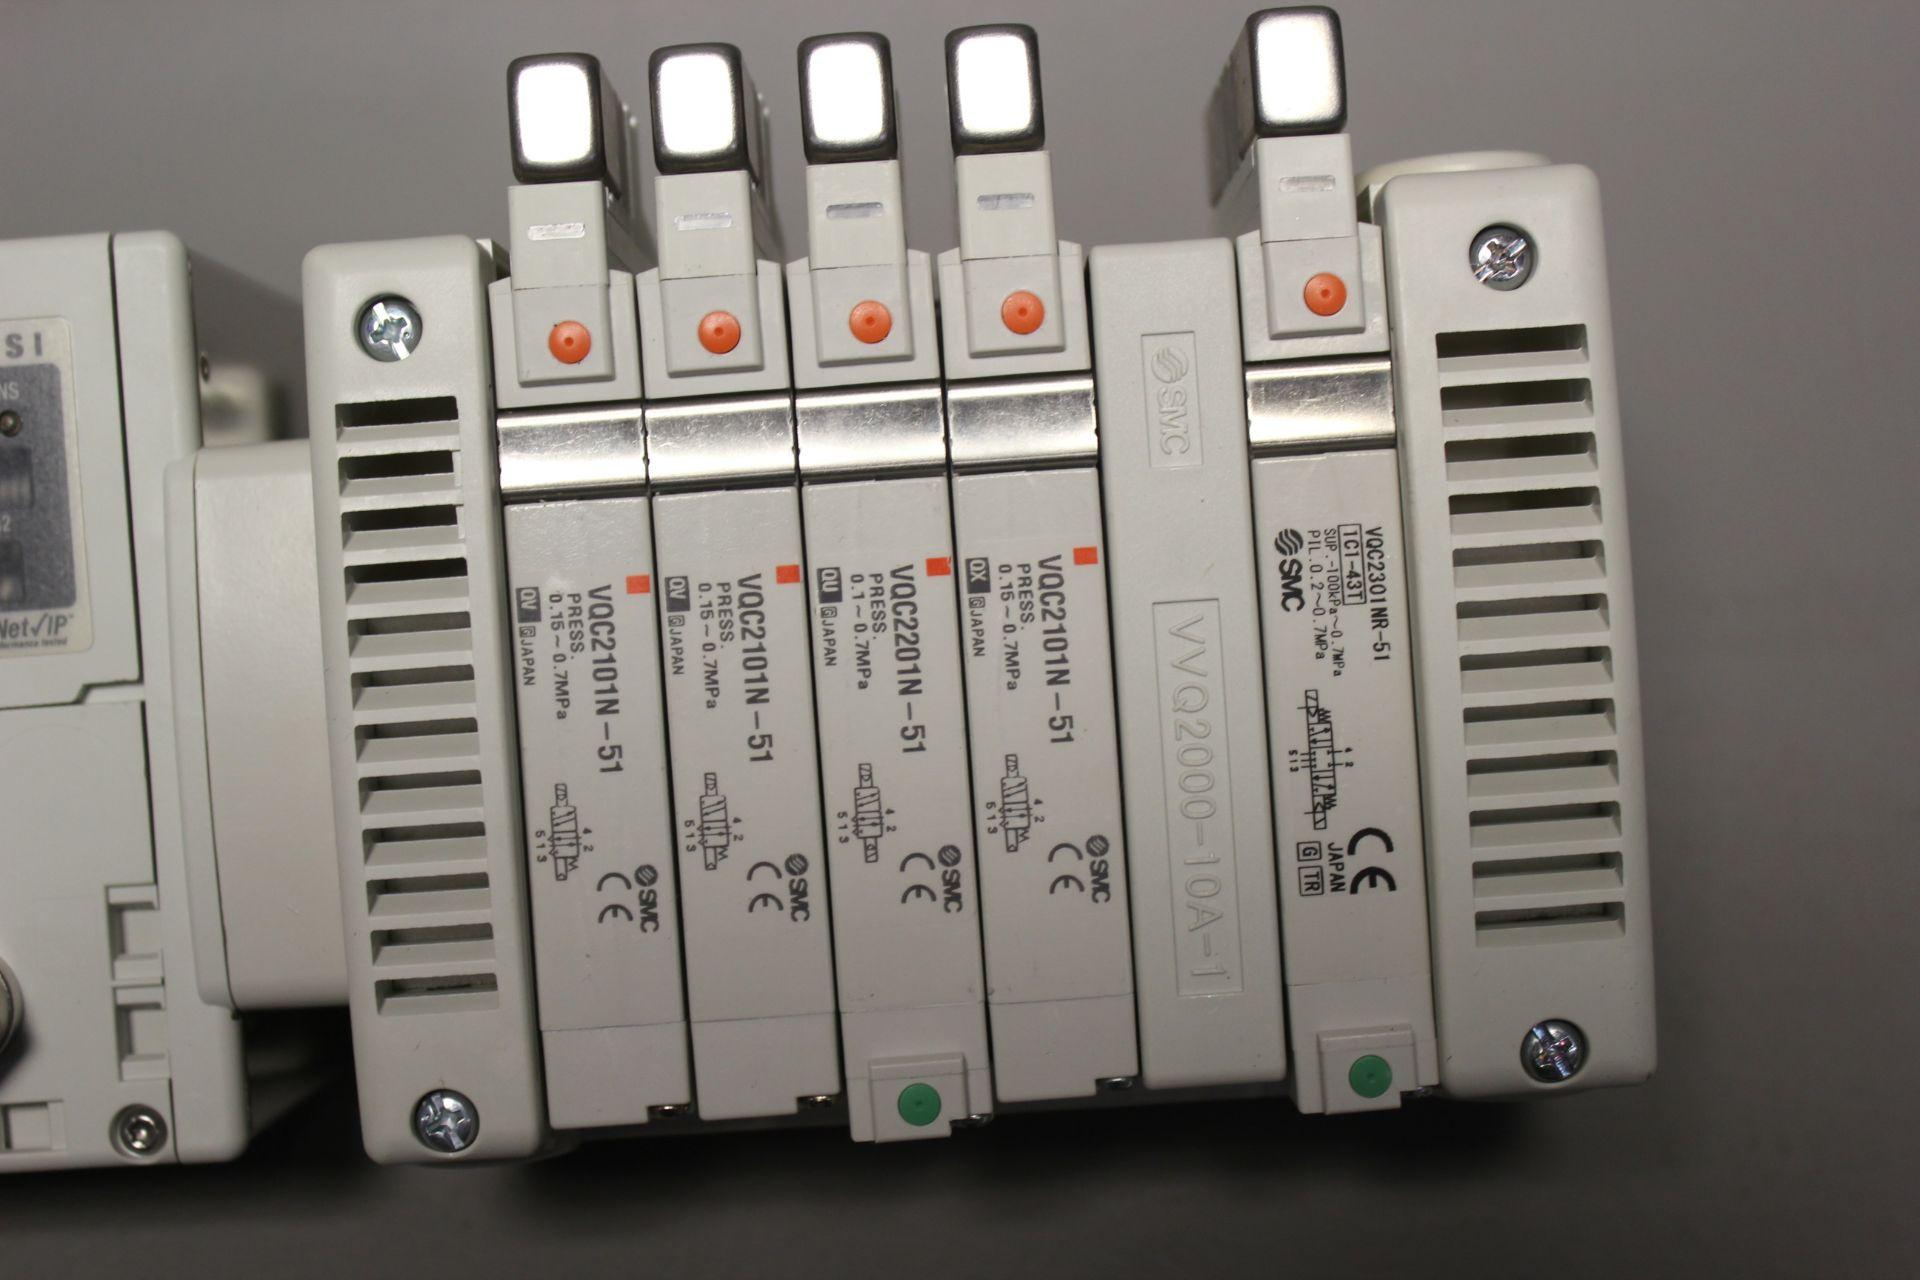 NEW SMC MANIFOLD WITH SOLENOID VALVES, ETHERNET/IP I/O - Image 2 of 8